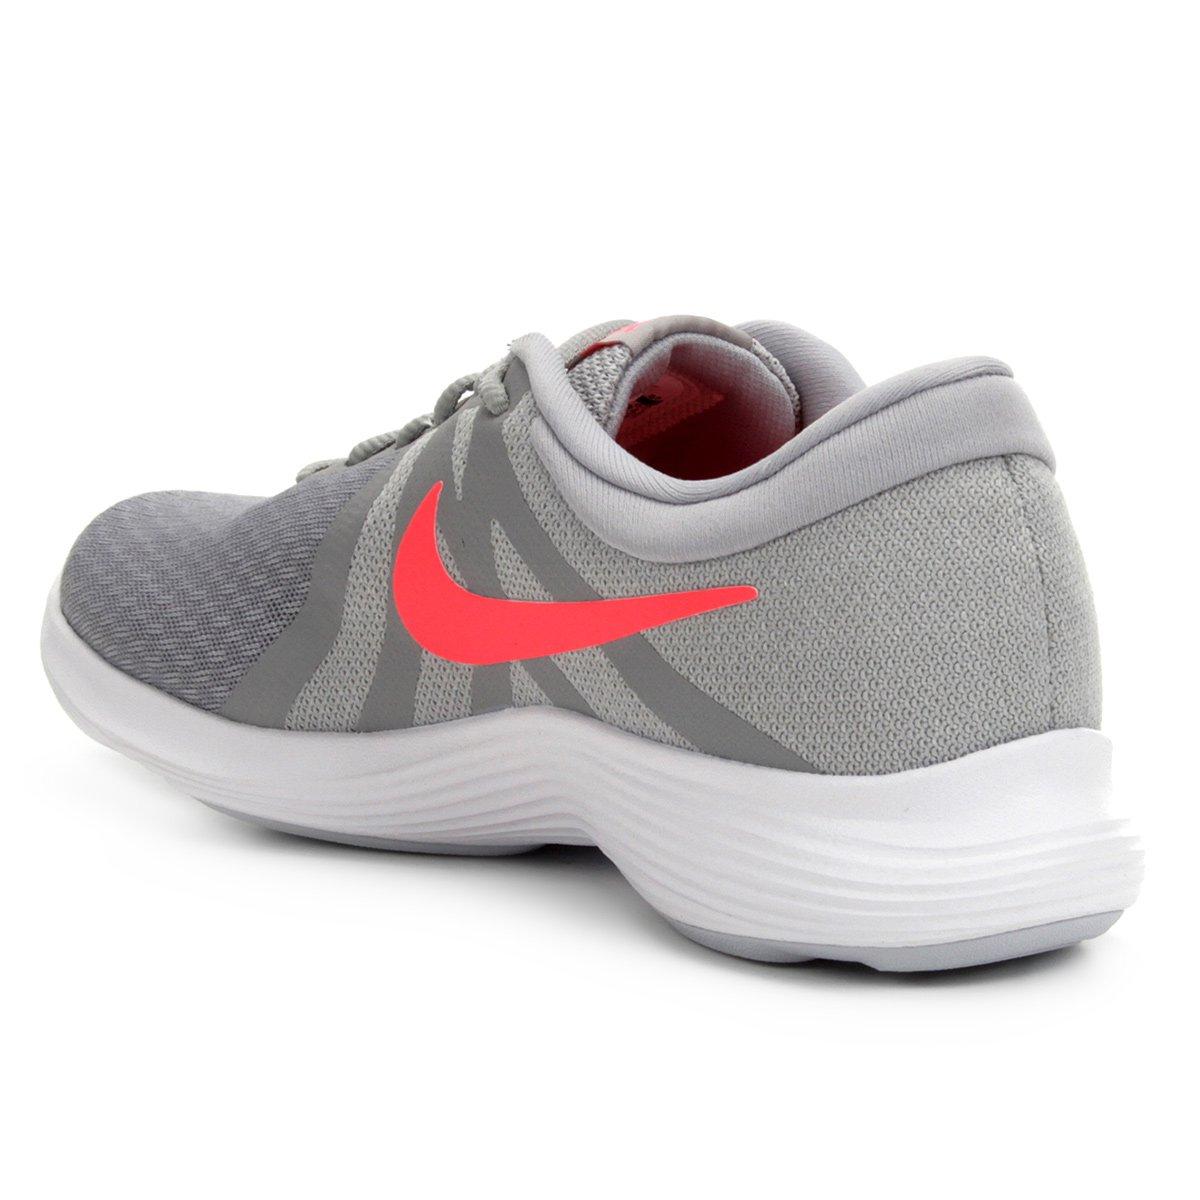 e820737464667 Tênis Nike Wmns Revolution 4 Feminino